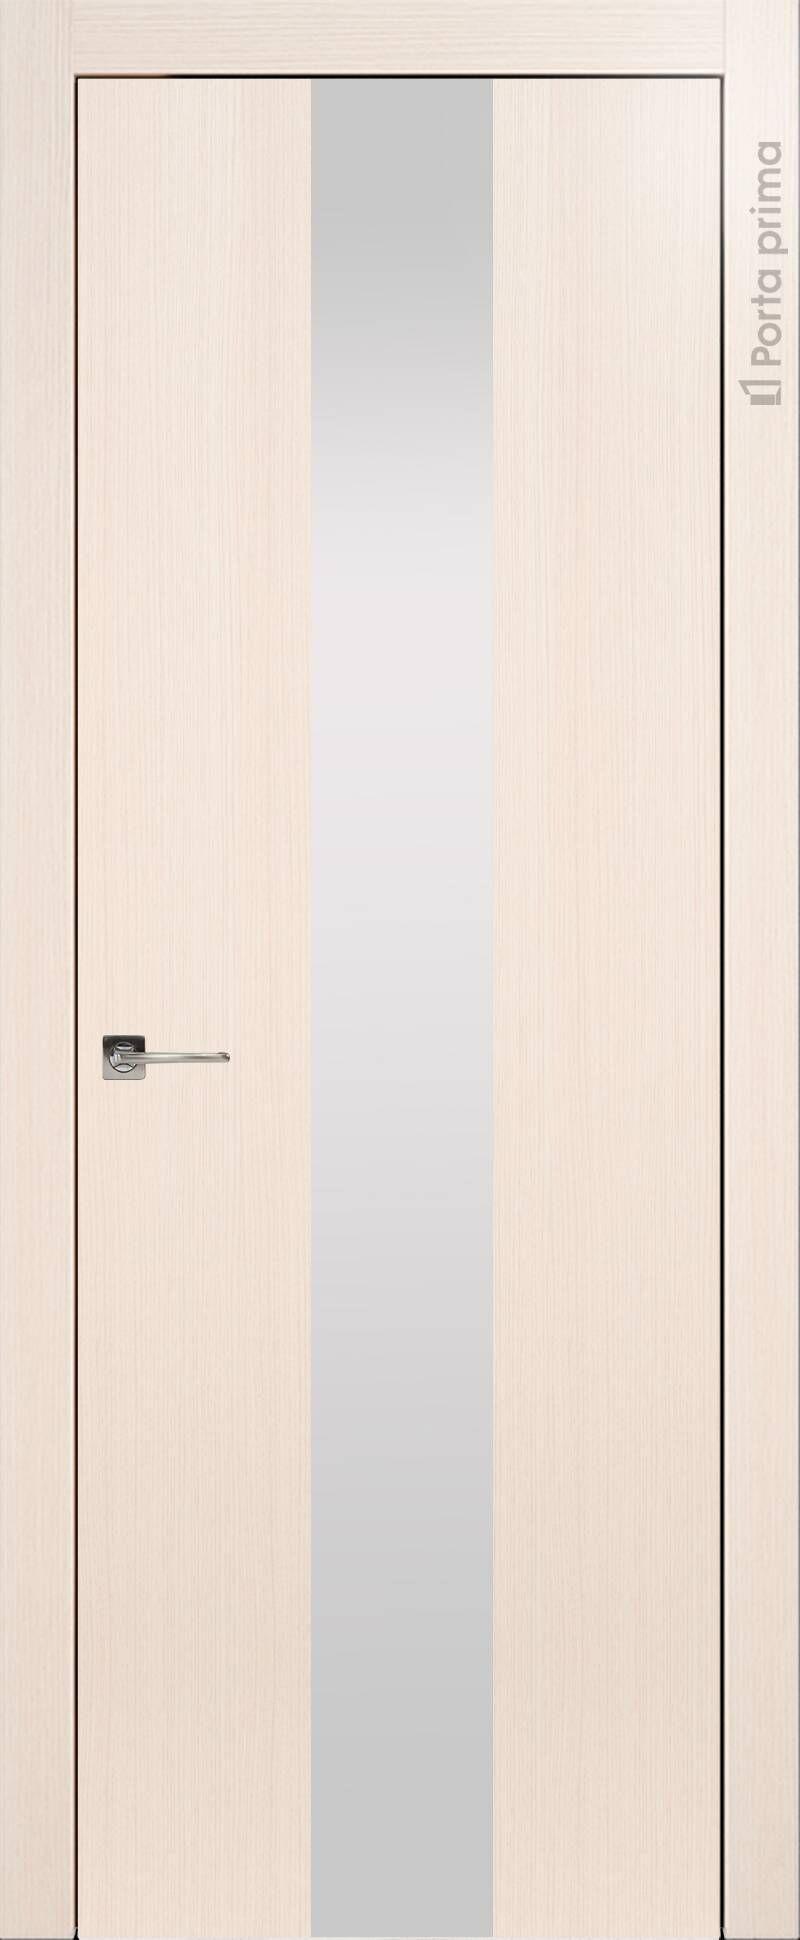 Tivoli Ж-1 цвет - Беленый дуб Со стеклом (ДО)